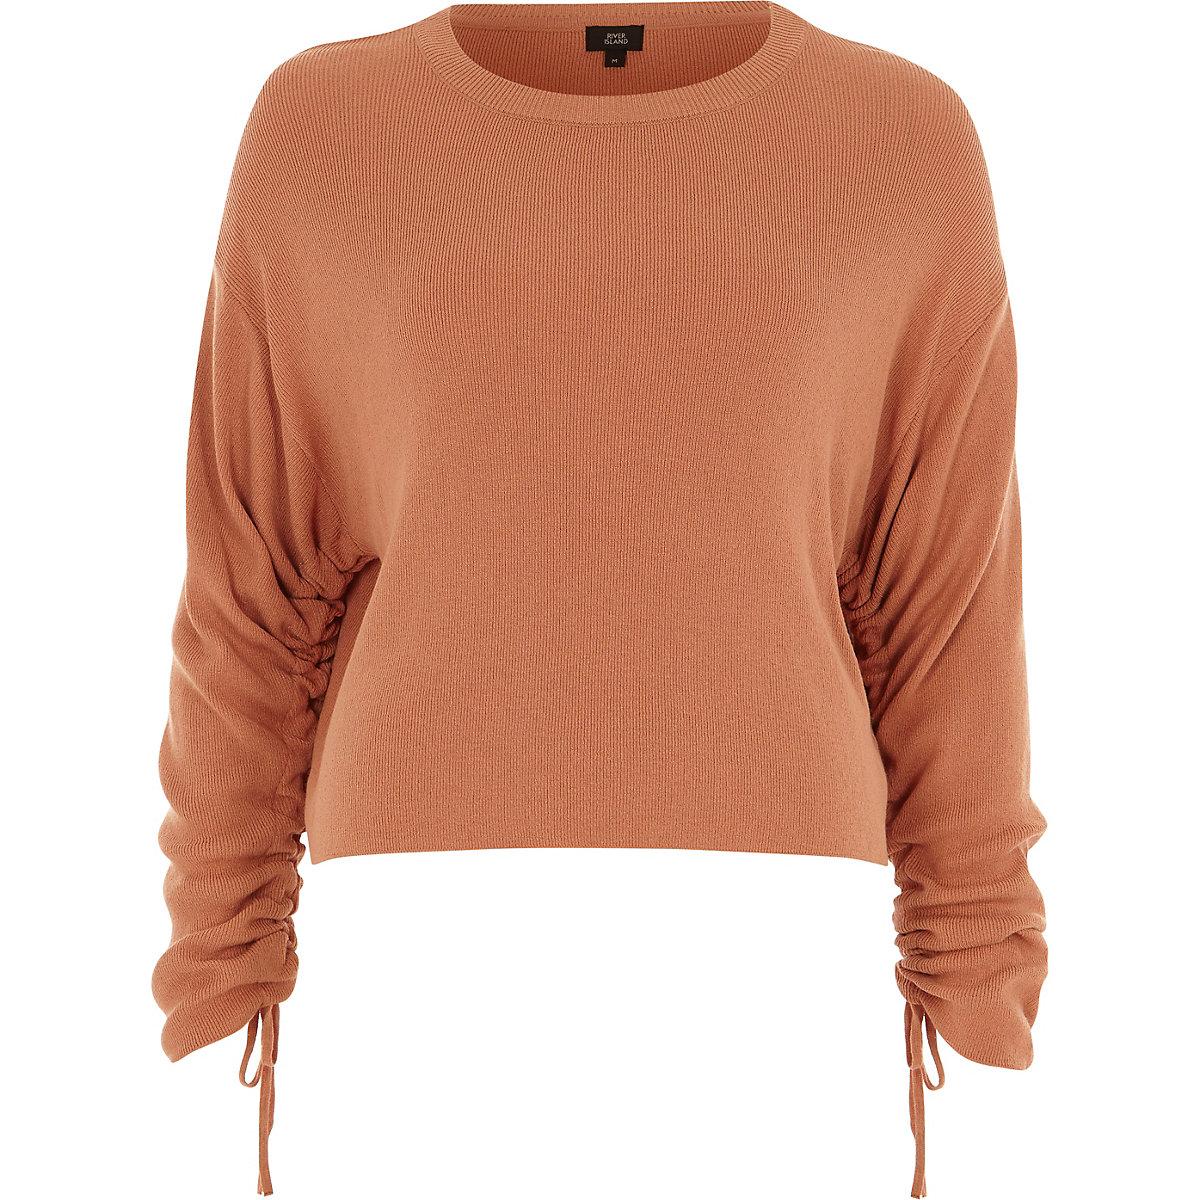 Light orange ruched long sleeve knit top